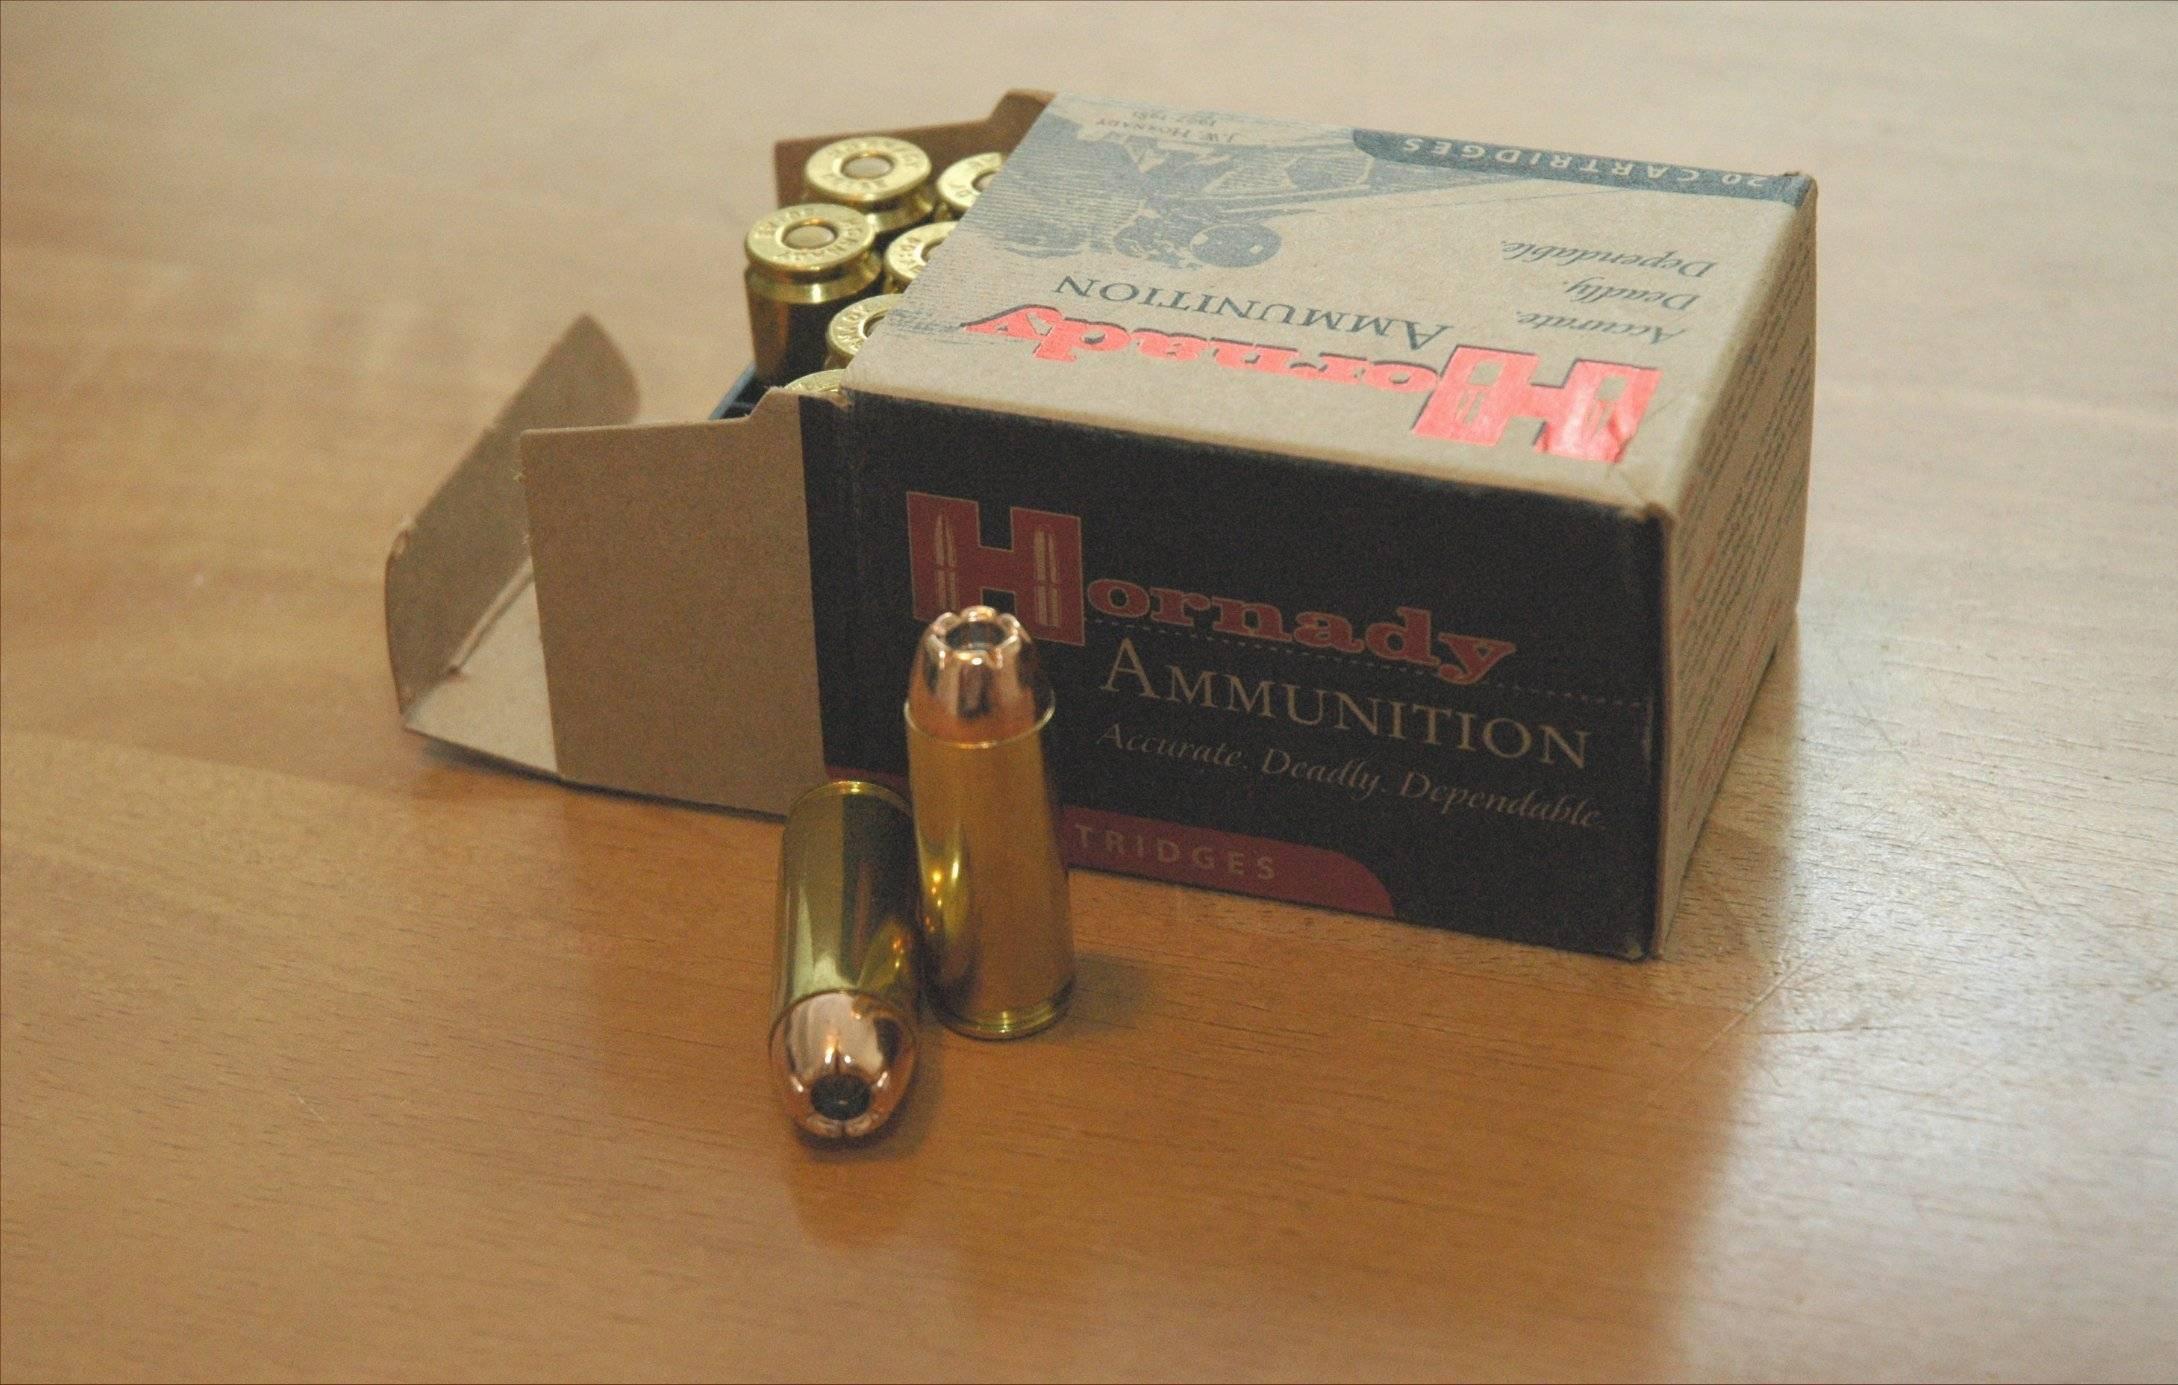 50 ае – патрон 50 action express – характеристики, описание, оружие, фото